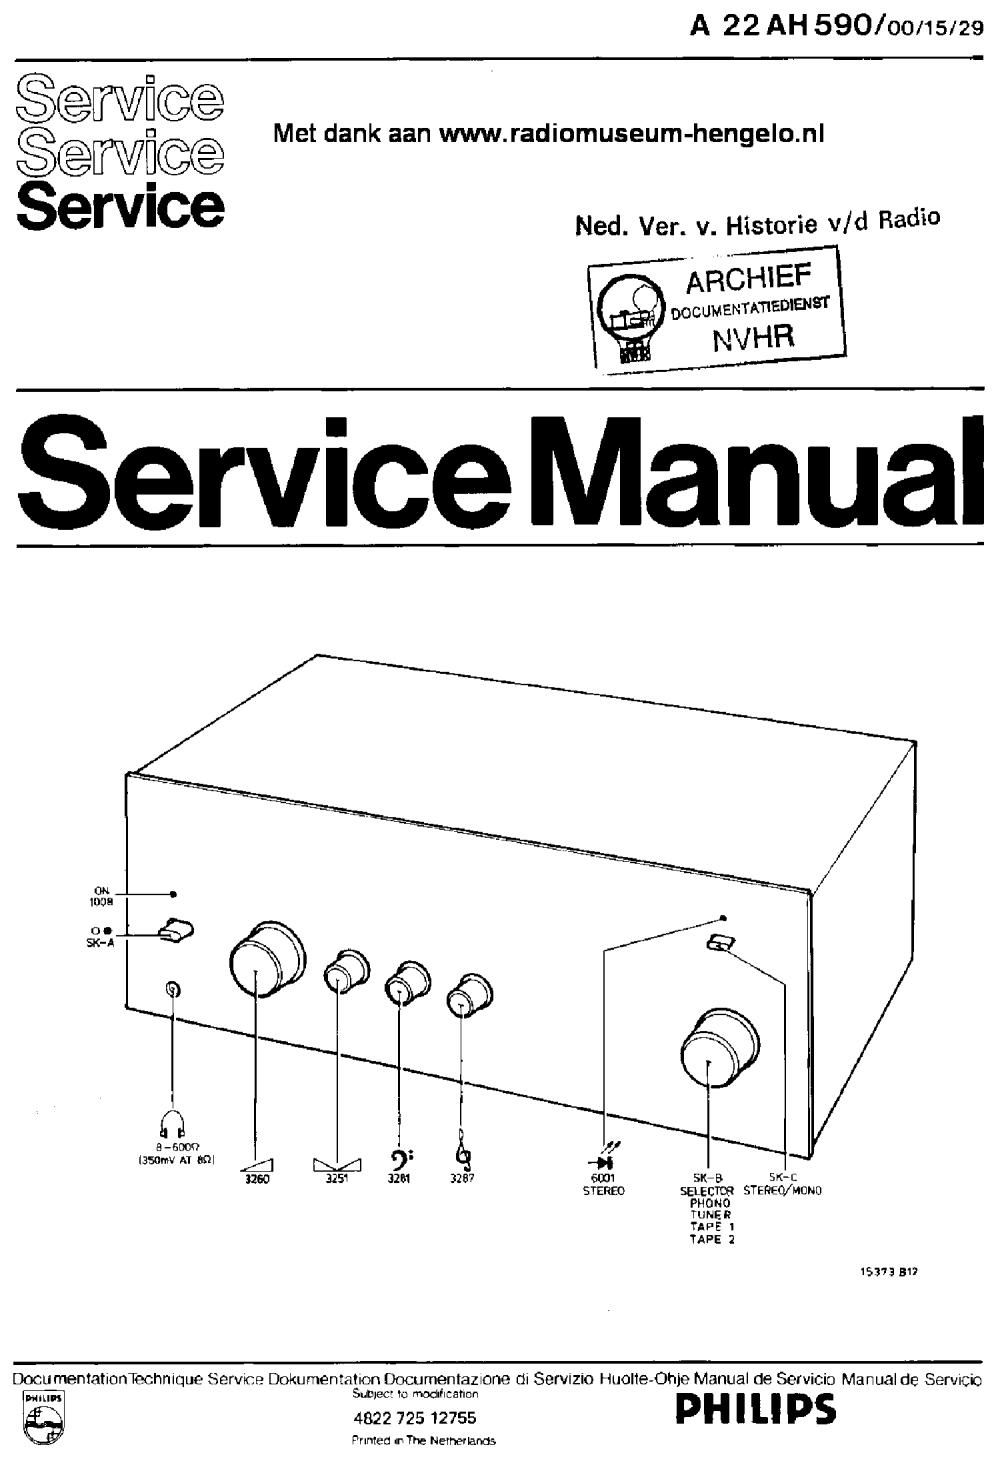 medium resolution of renault radiosat 6000 wiring diagram manual e books mercury wiring diagrams renault radiosat 6000 wiring diagram